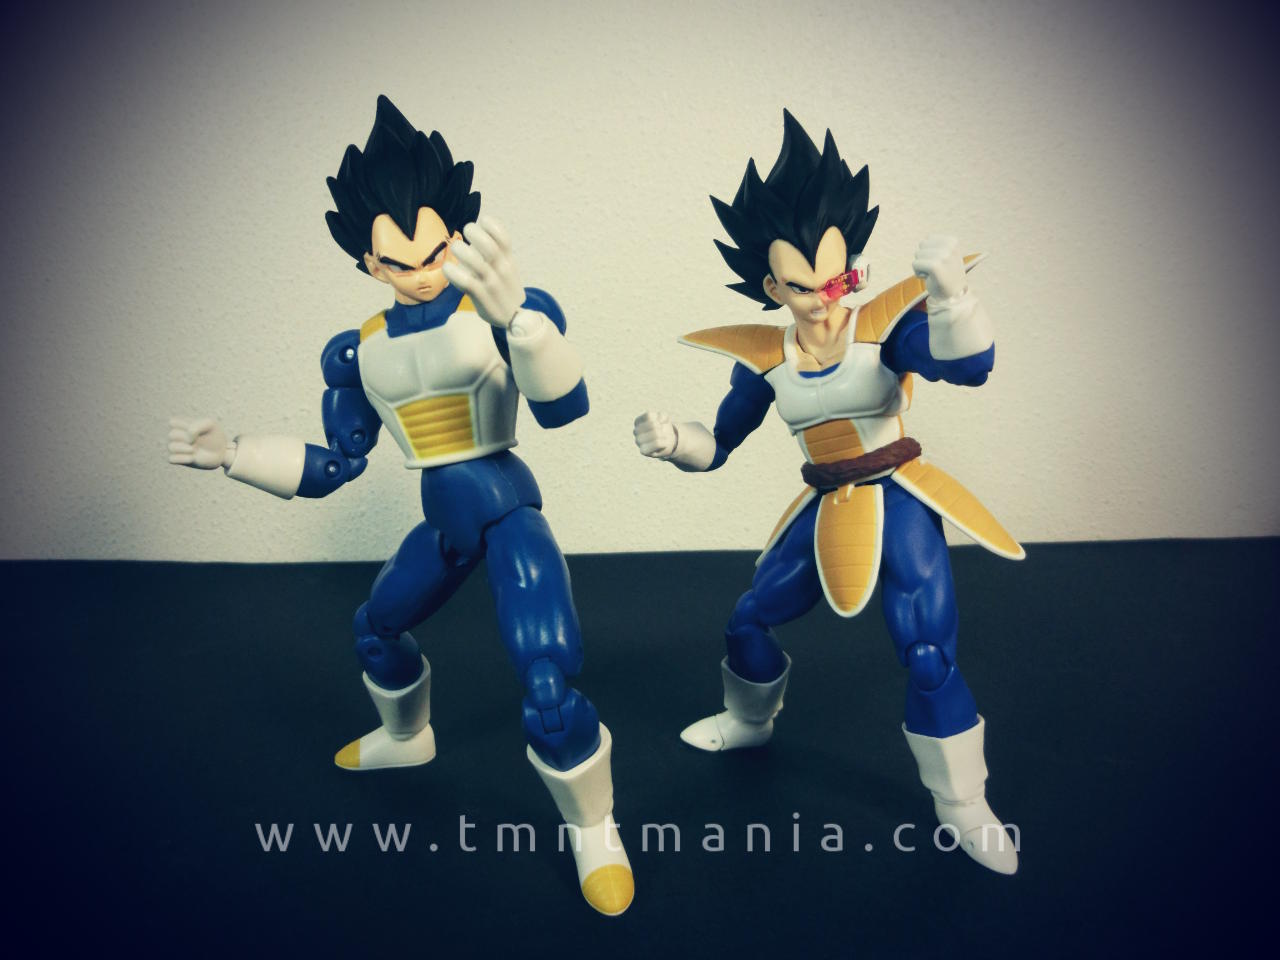 Figuras de SH Figuarts y DS Series de Vegeta en la misma pose